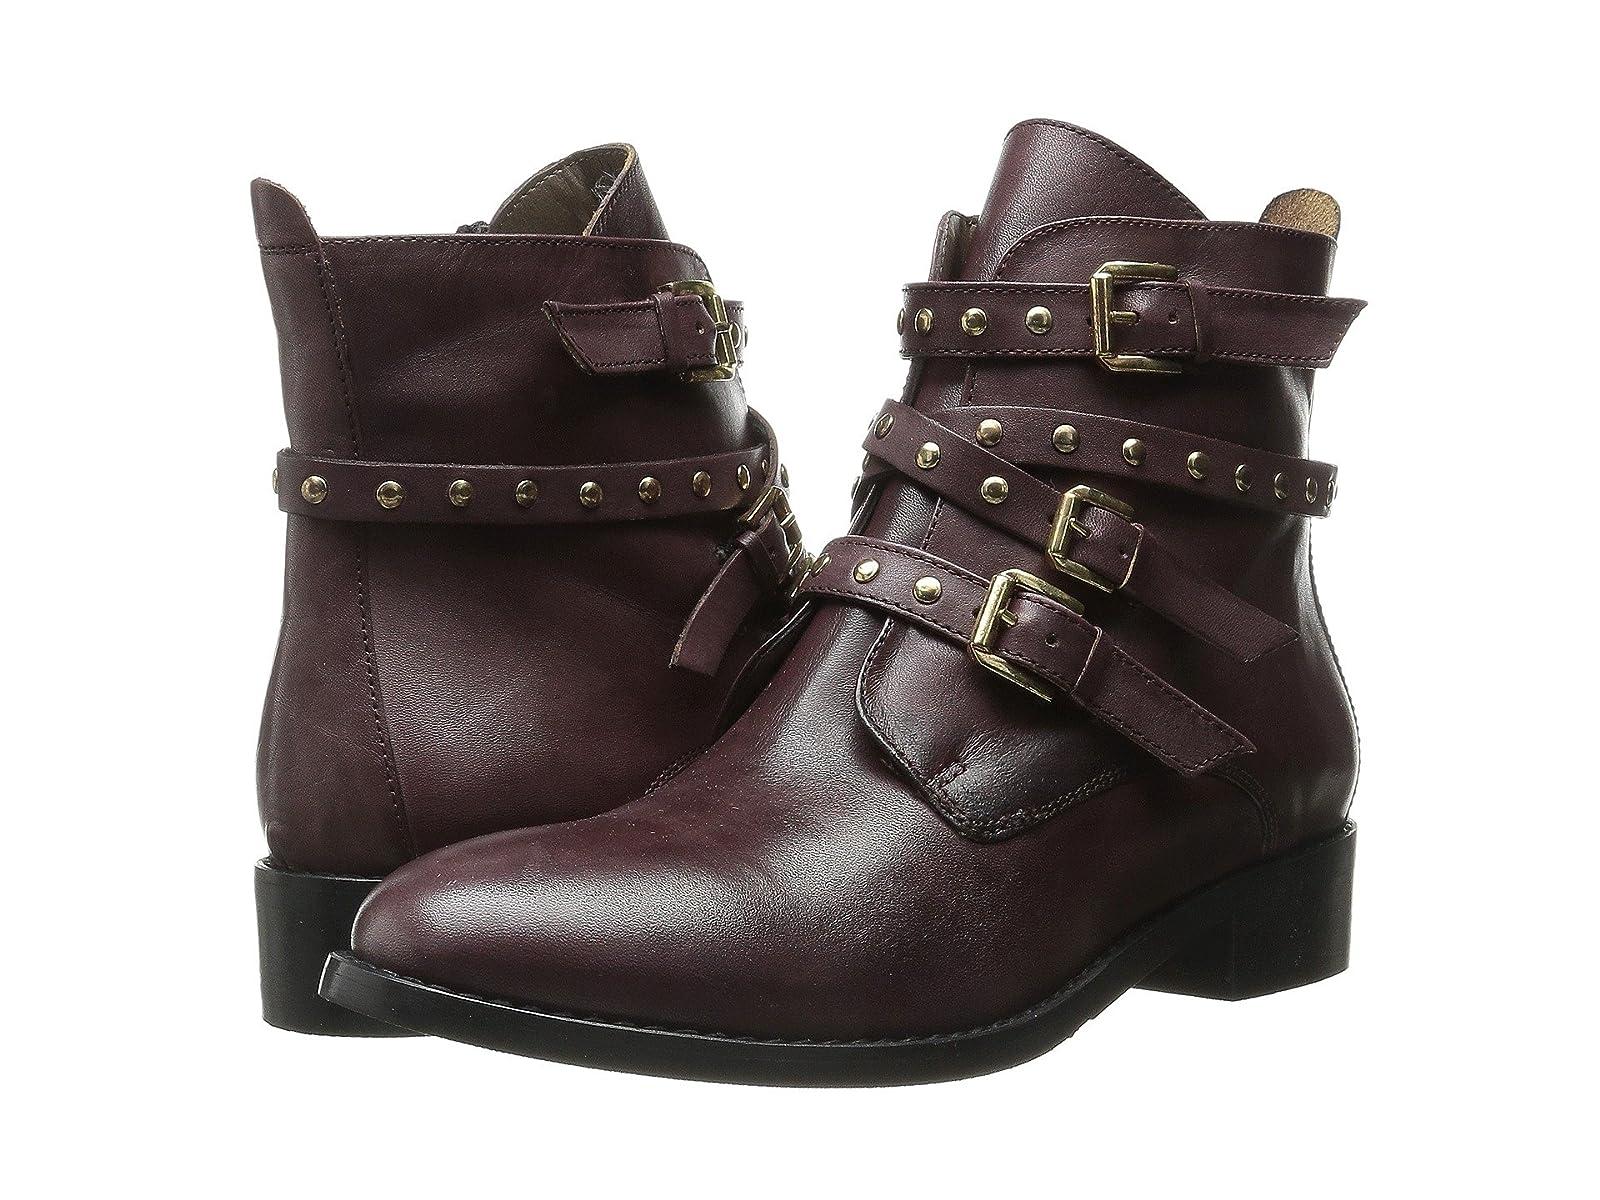 Bella-Vita Mod-ItalyCheap and distinctive eye-catching shoes